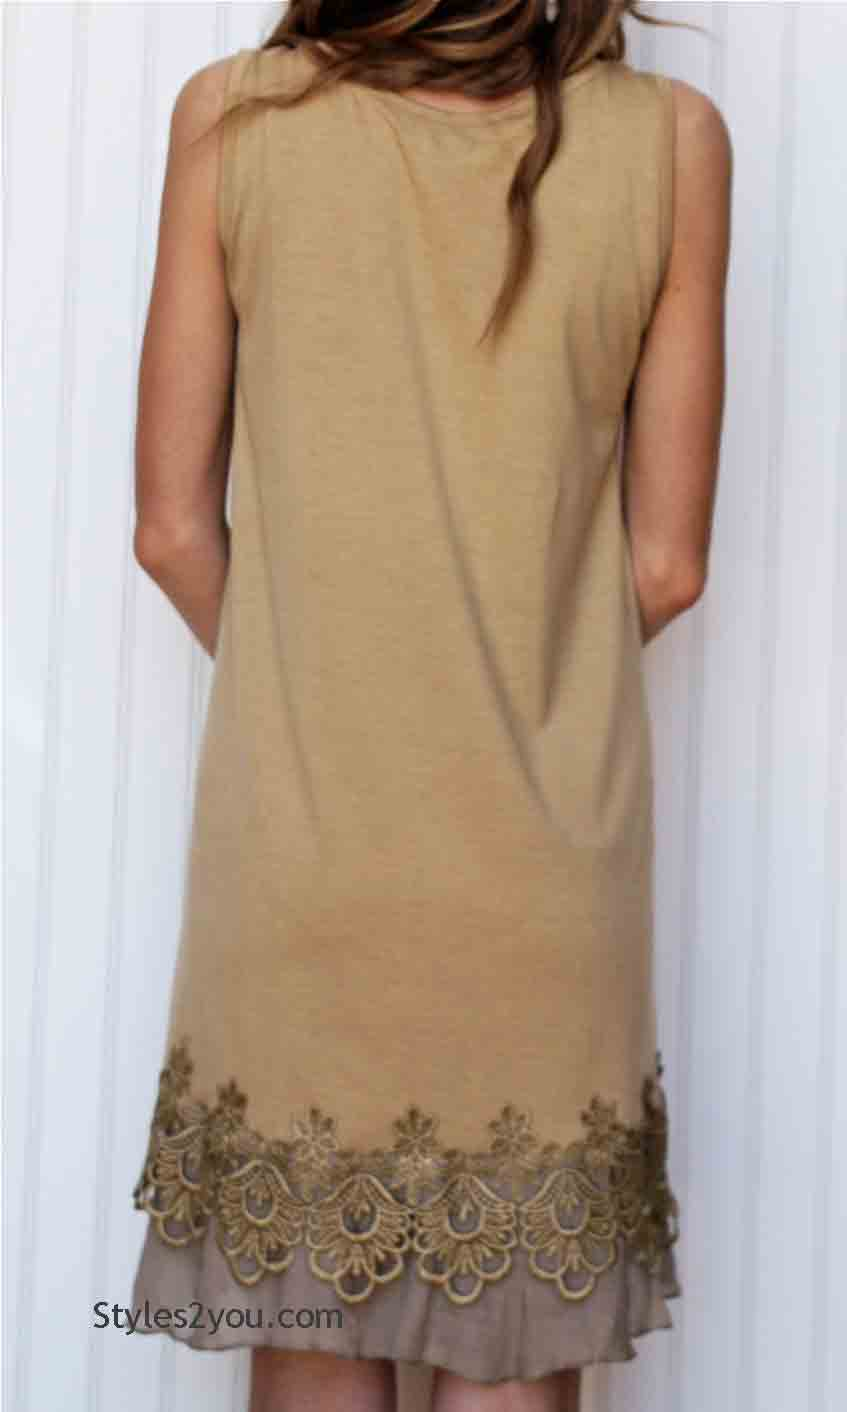 b766d61b9a6 Kyle Ladies Tunic Dress In Brown Pretty Angel Dresses  ANTS62756BR ...